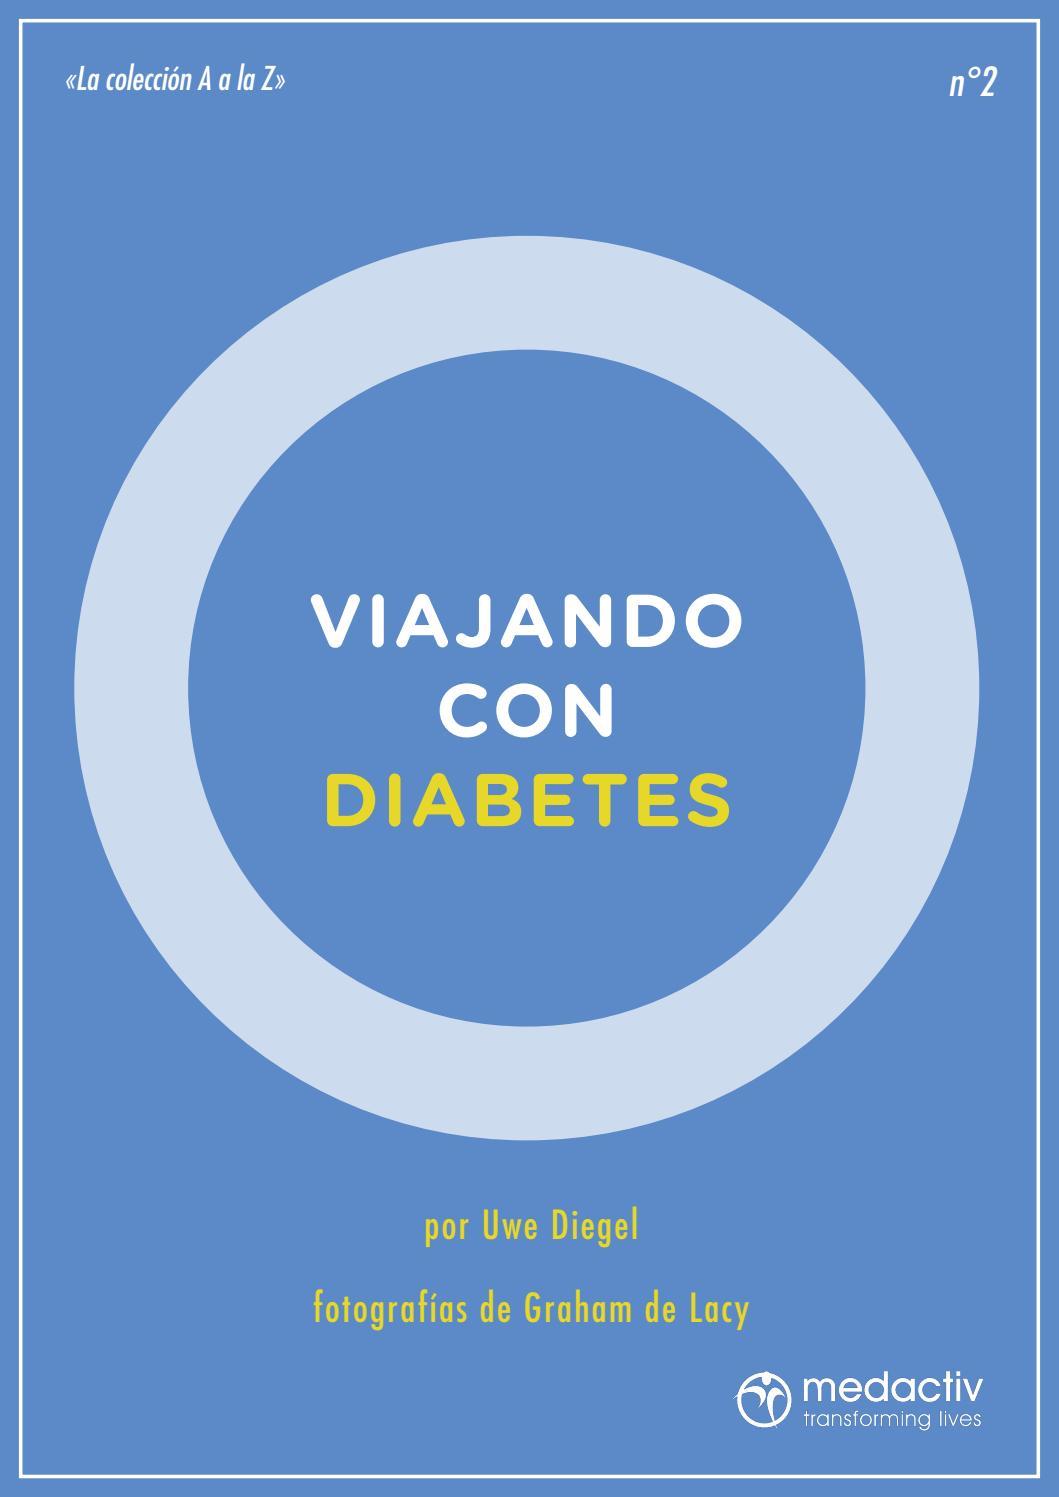 diabetes tableta o lado de la insulina